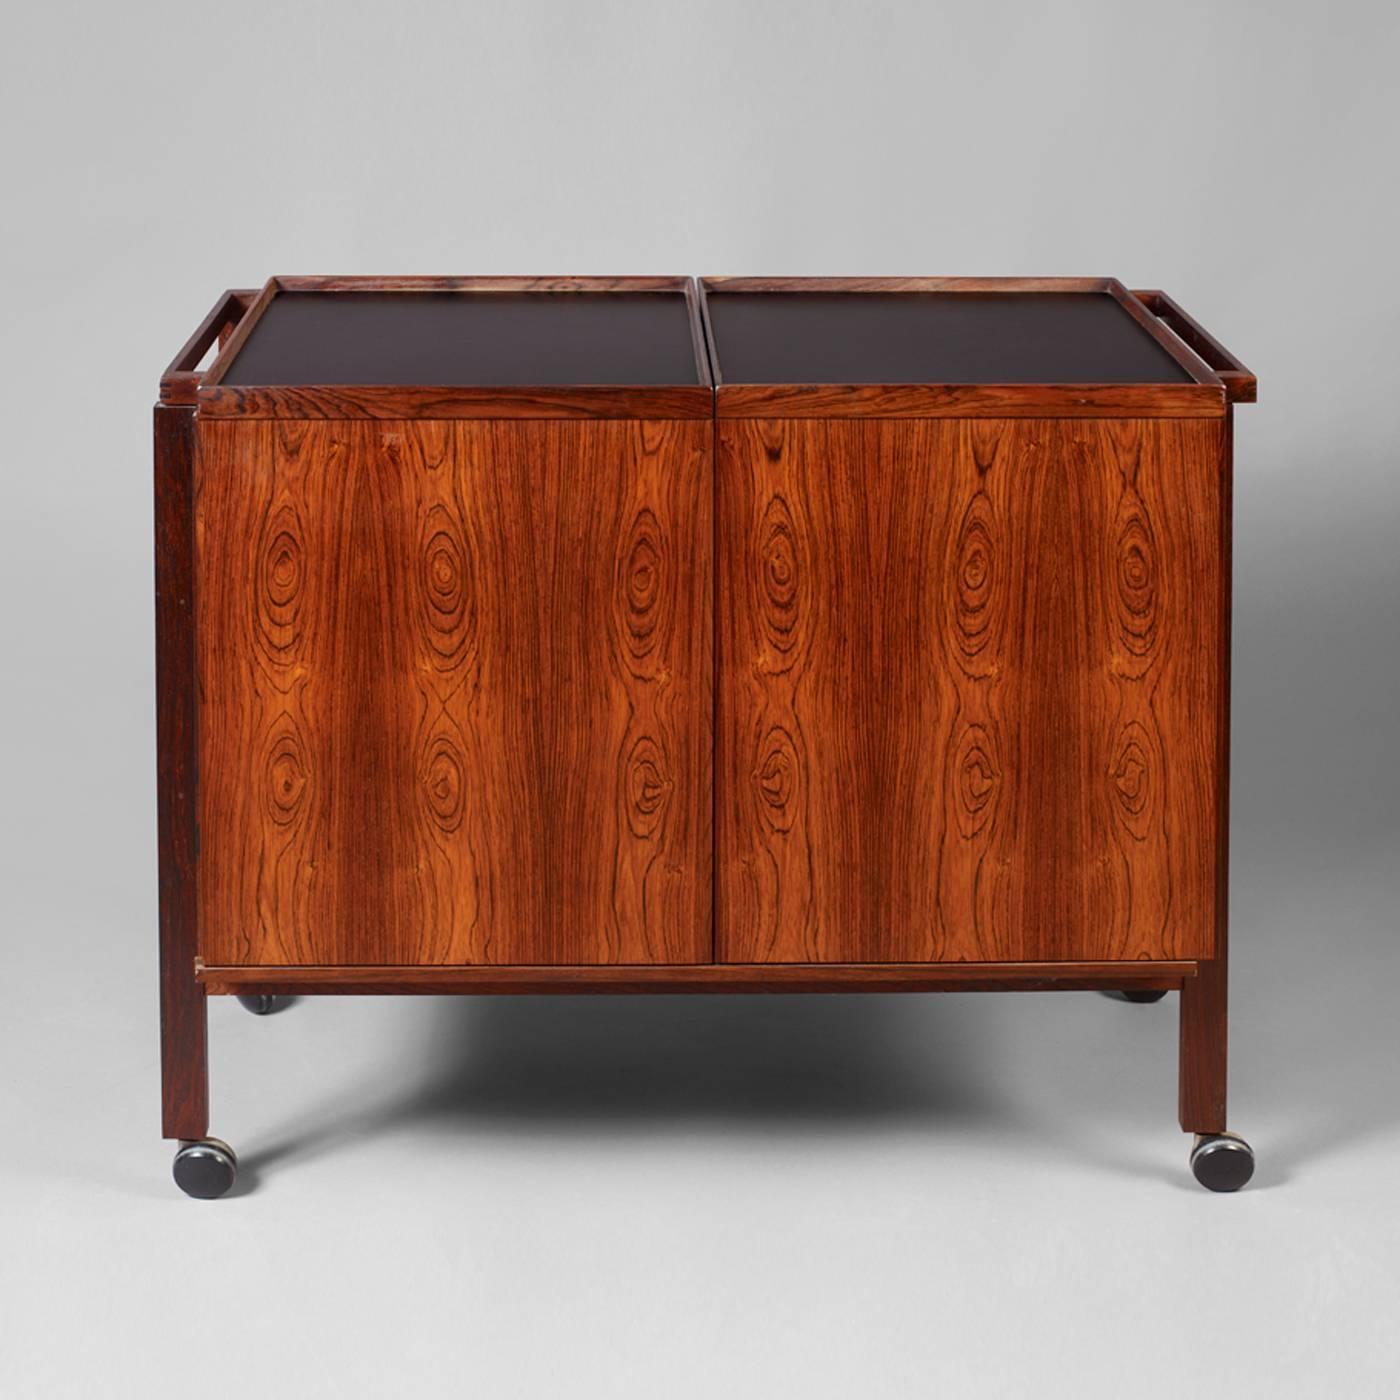 Niels erik glasdam jensen danish active mid 20th century for Mid 20th century furniture